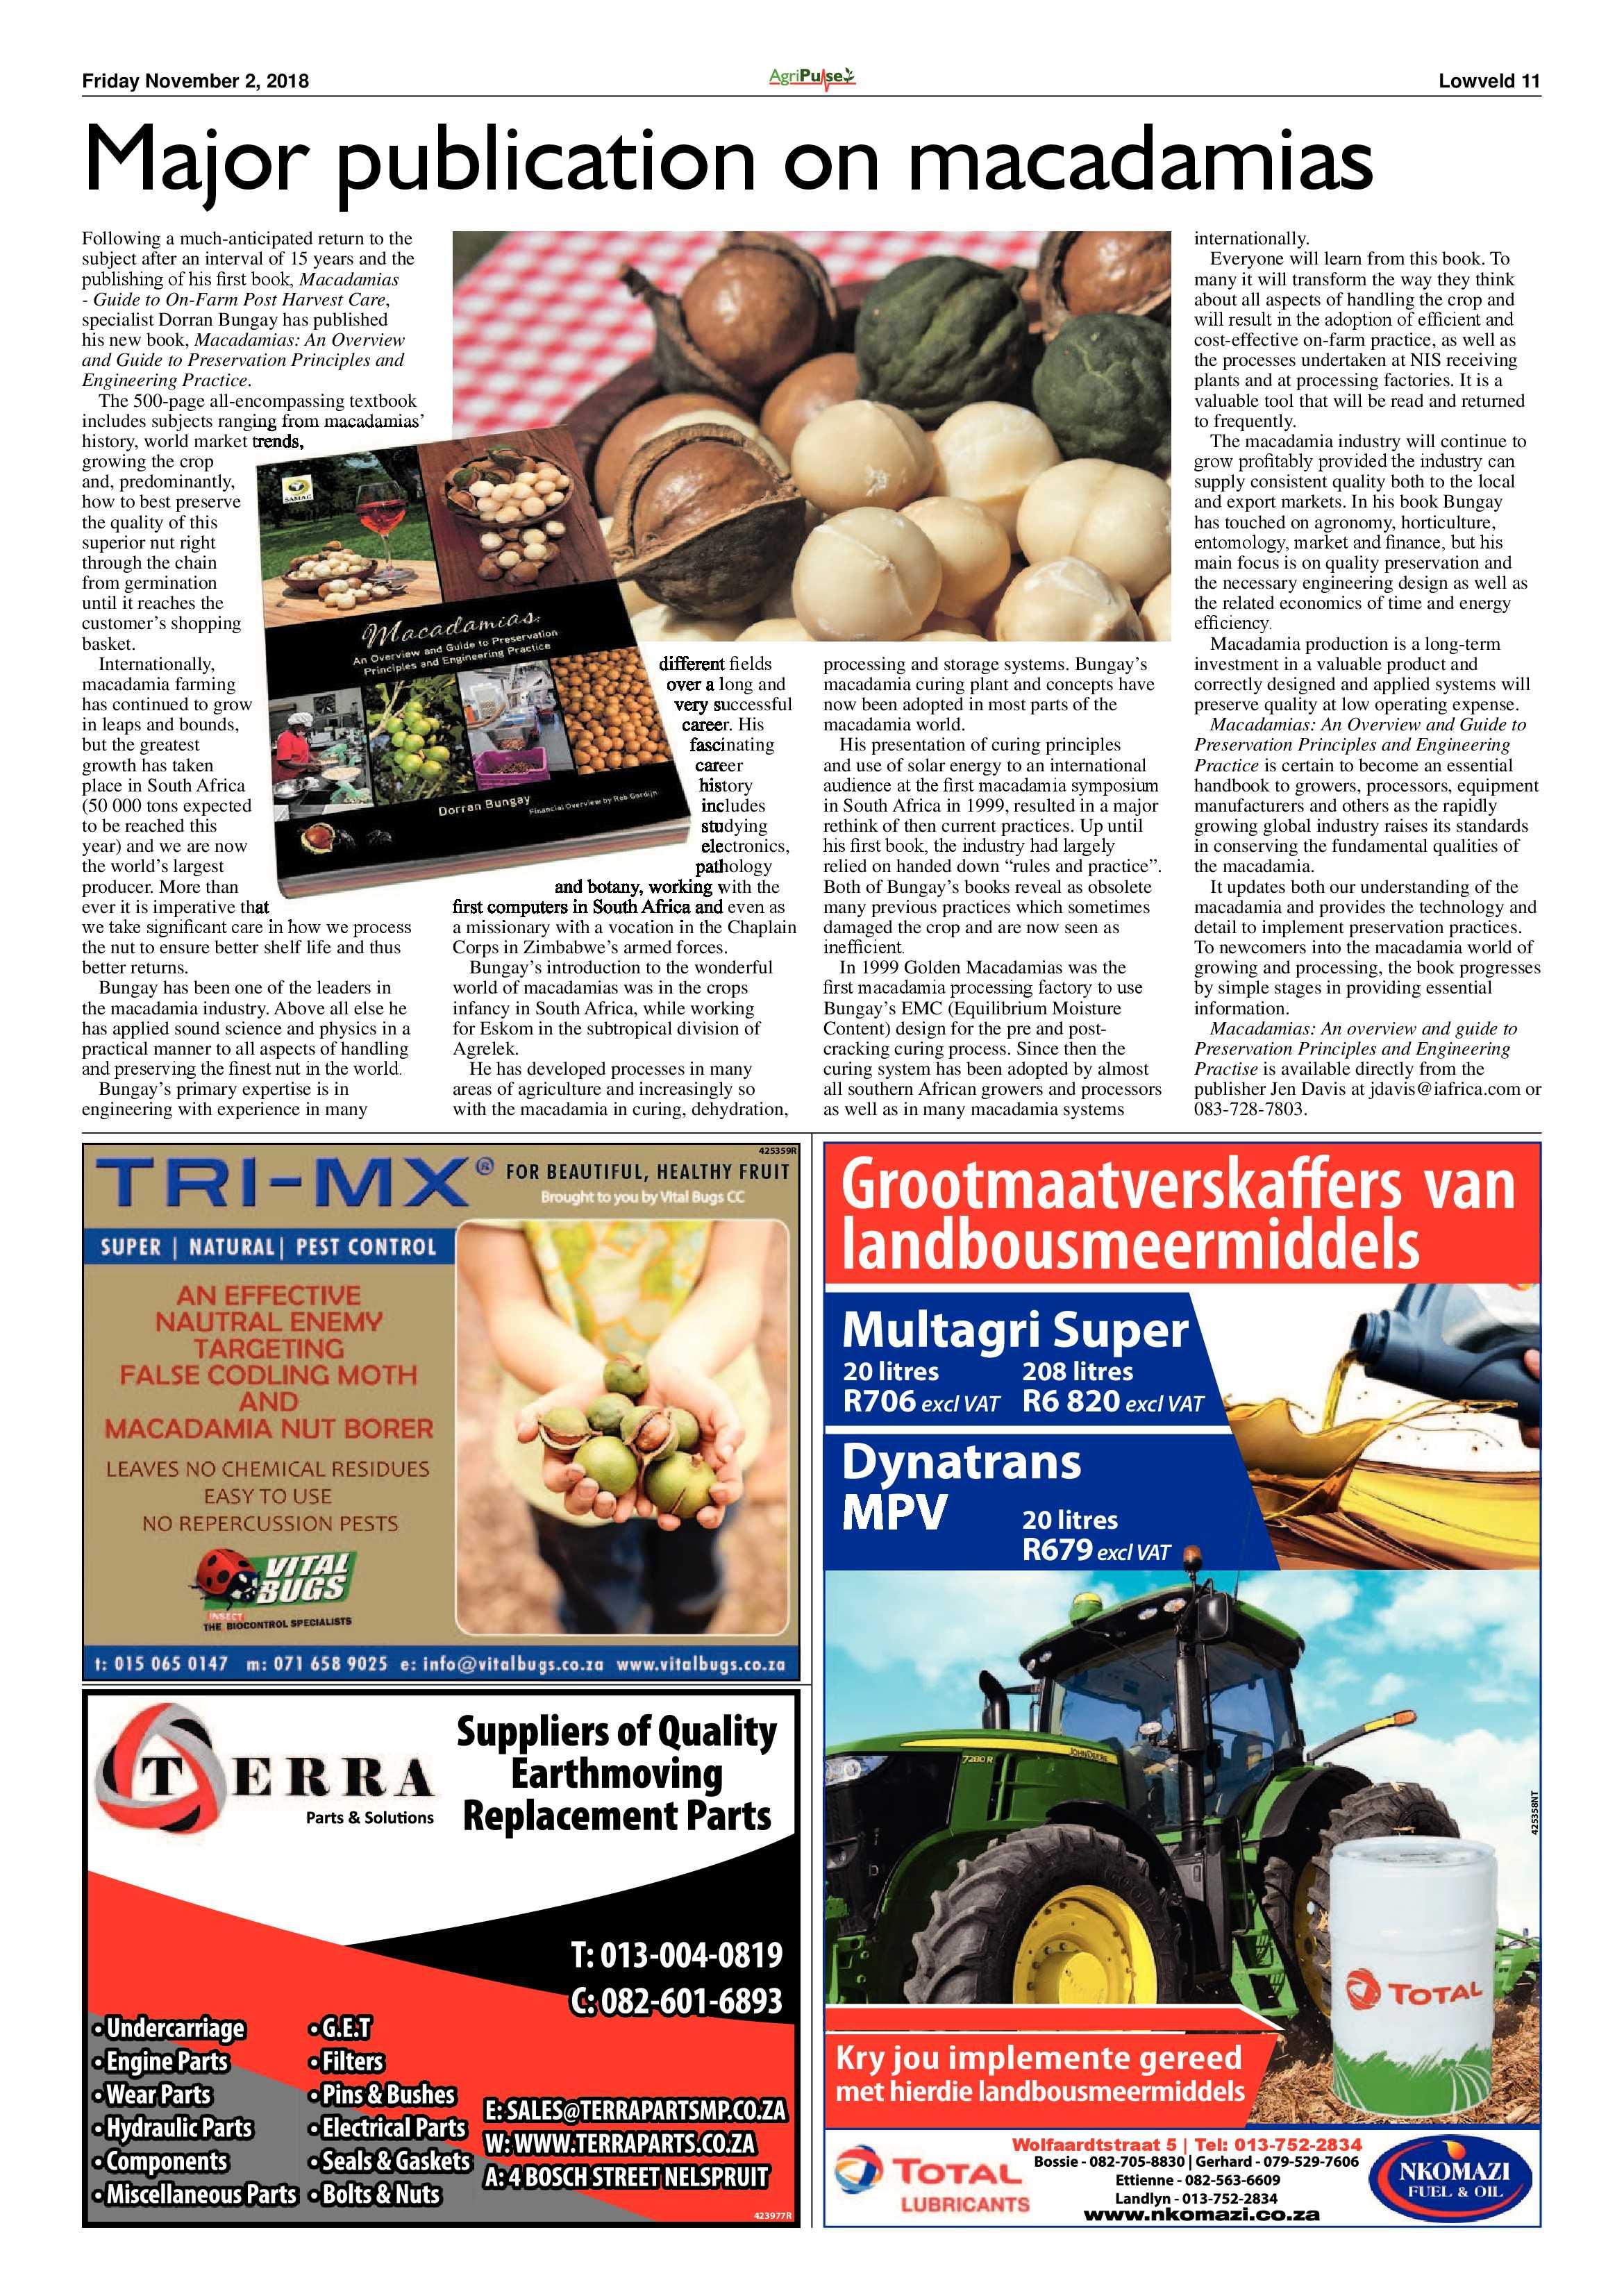 agripulse-november-2018-epapers-page-11